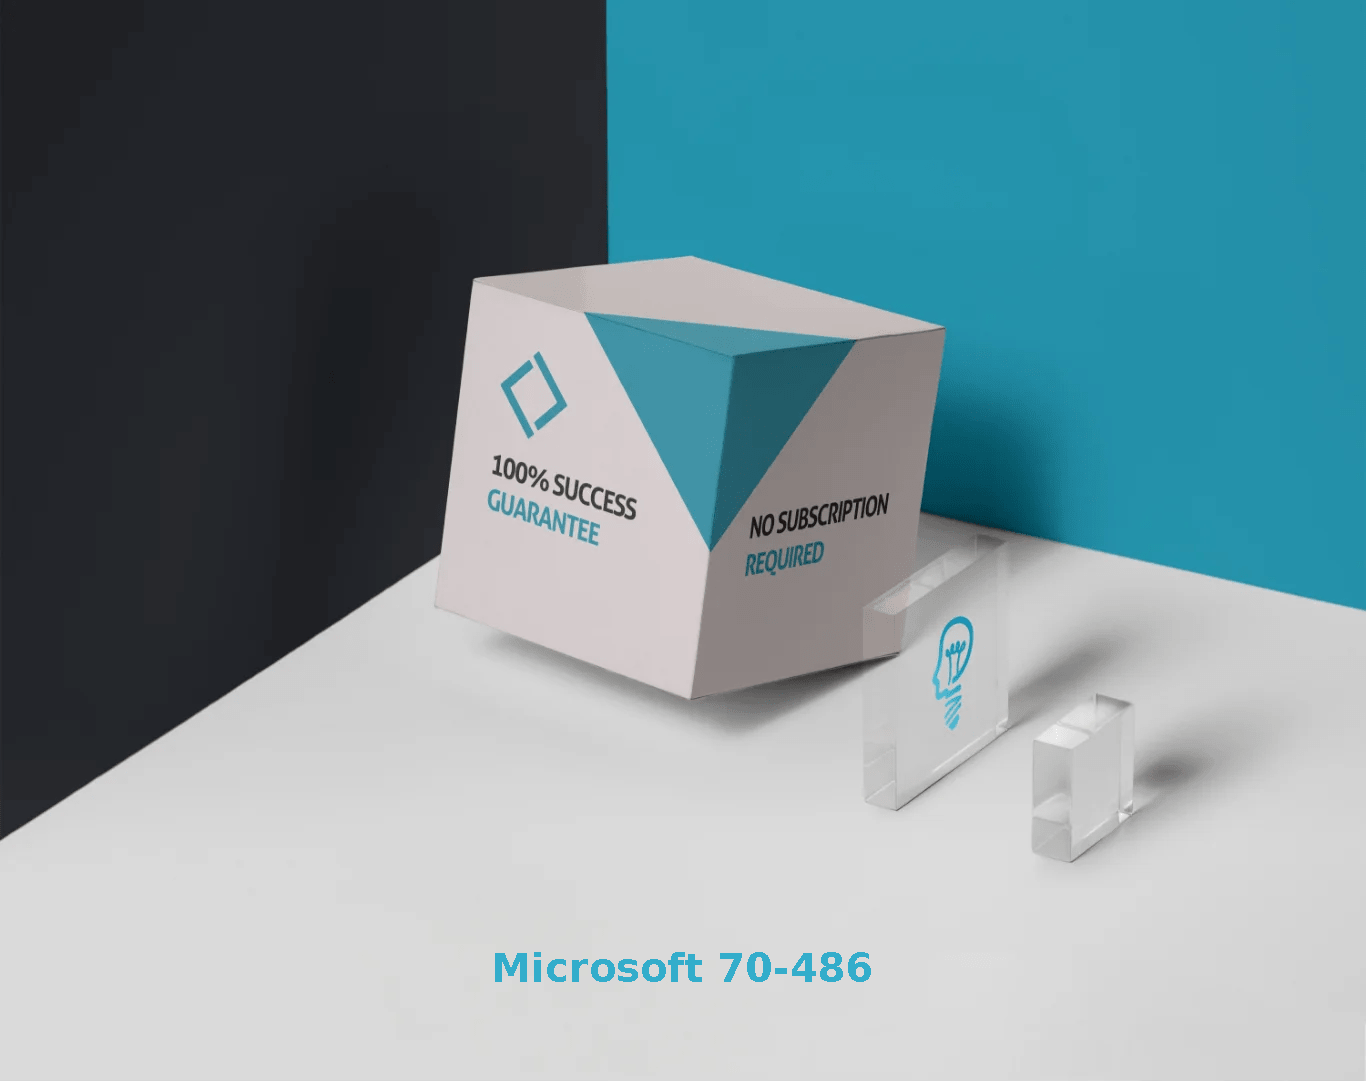 Microsoft 70-486 Exams